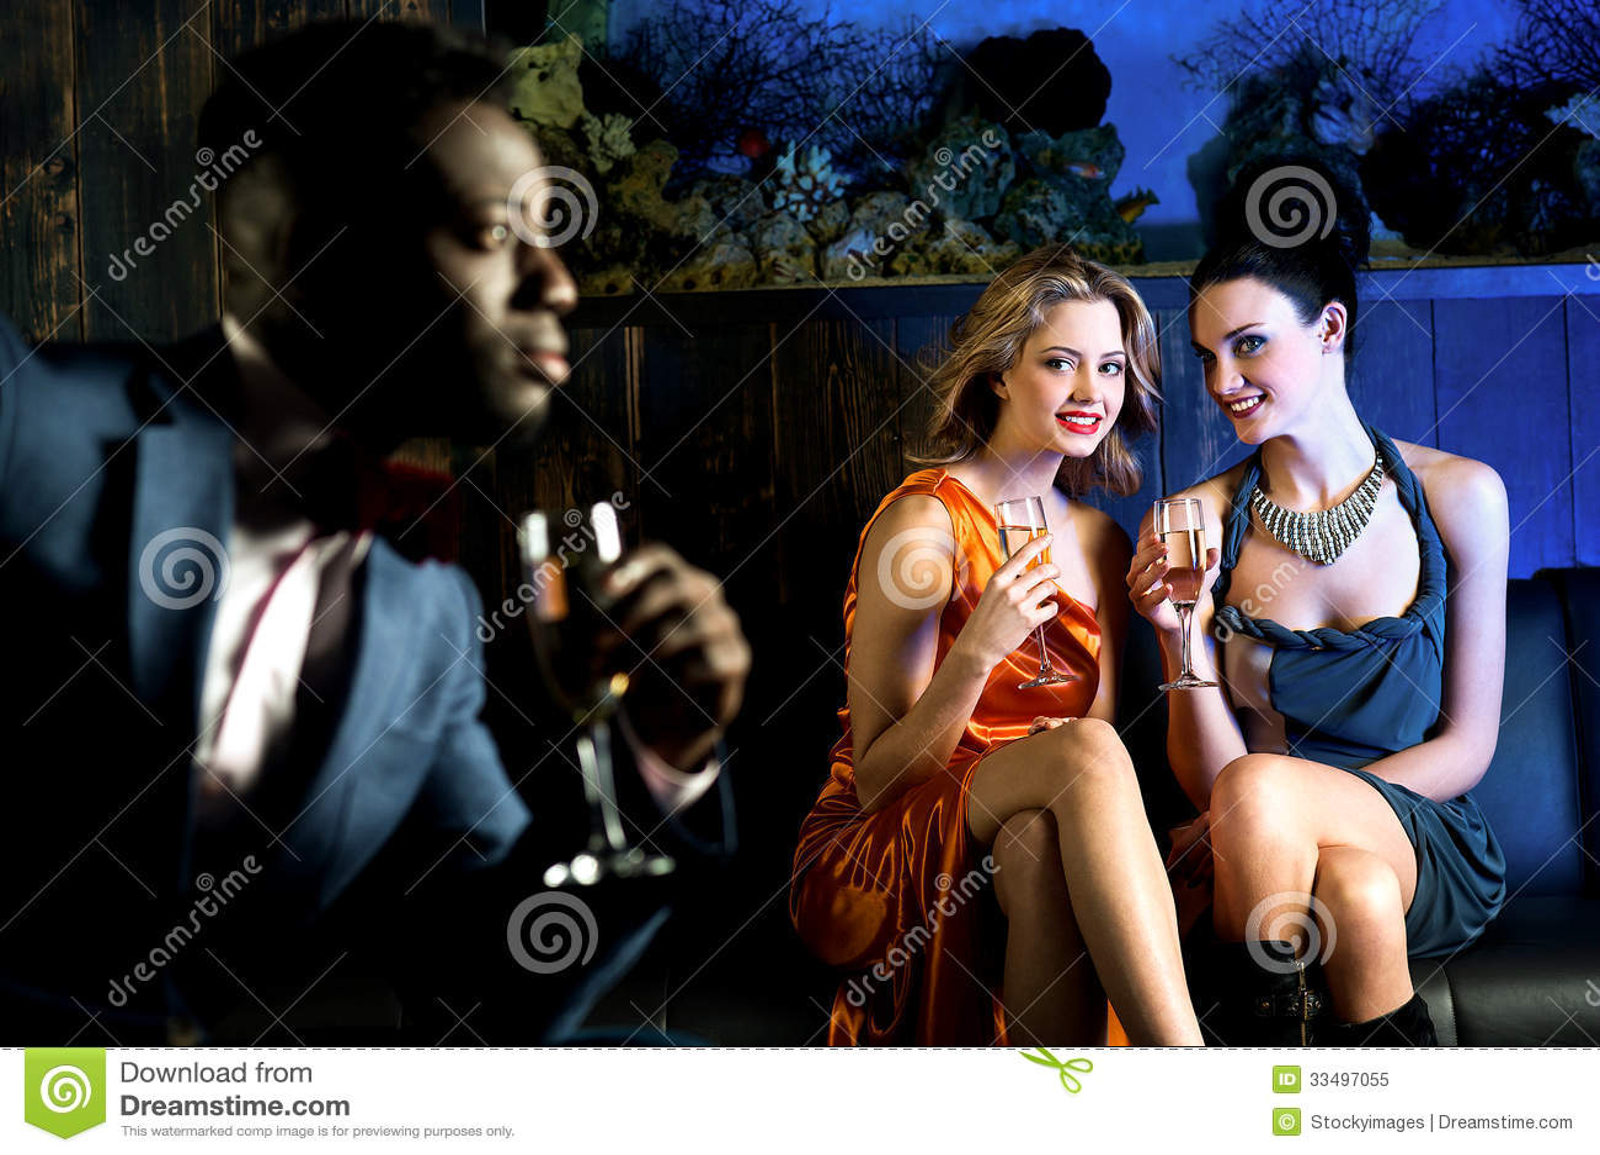 Jolies filles regardant fixement le jeune homme beau